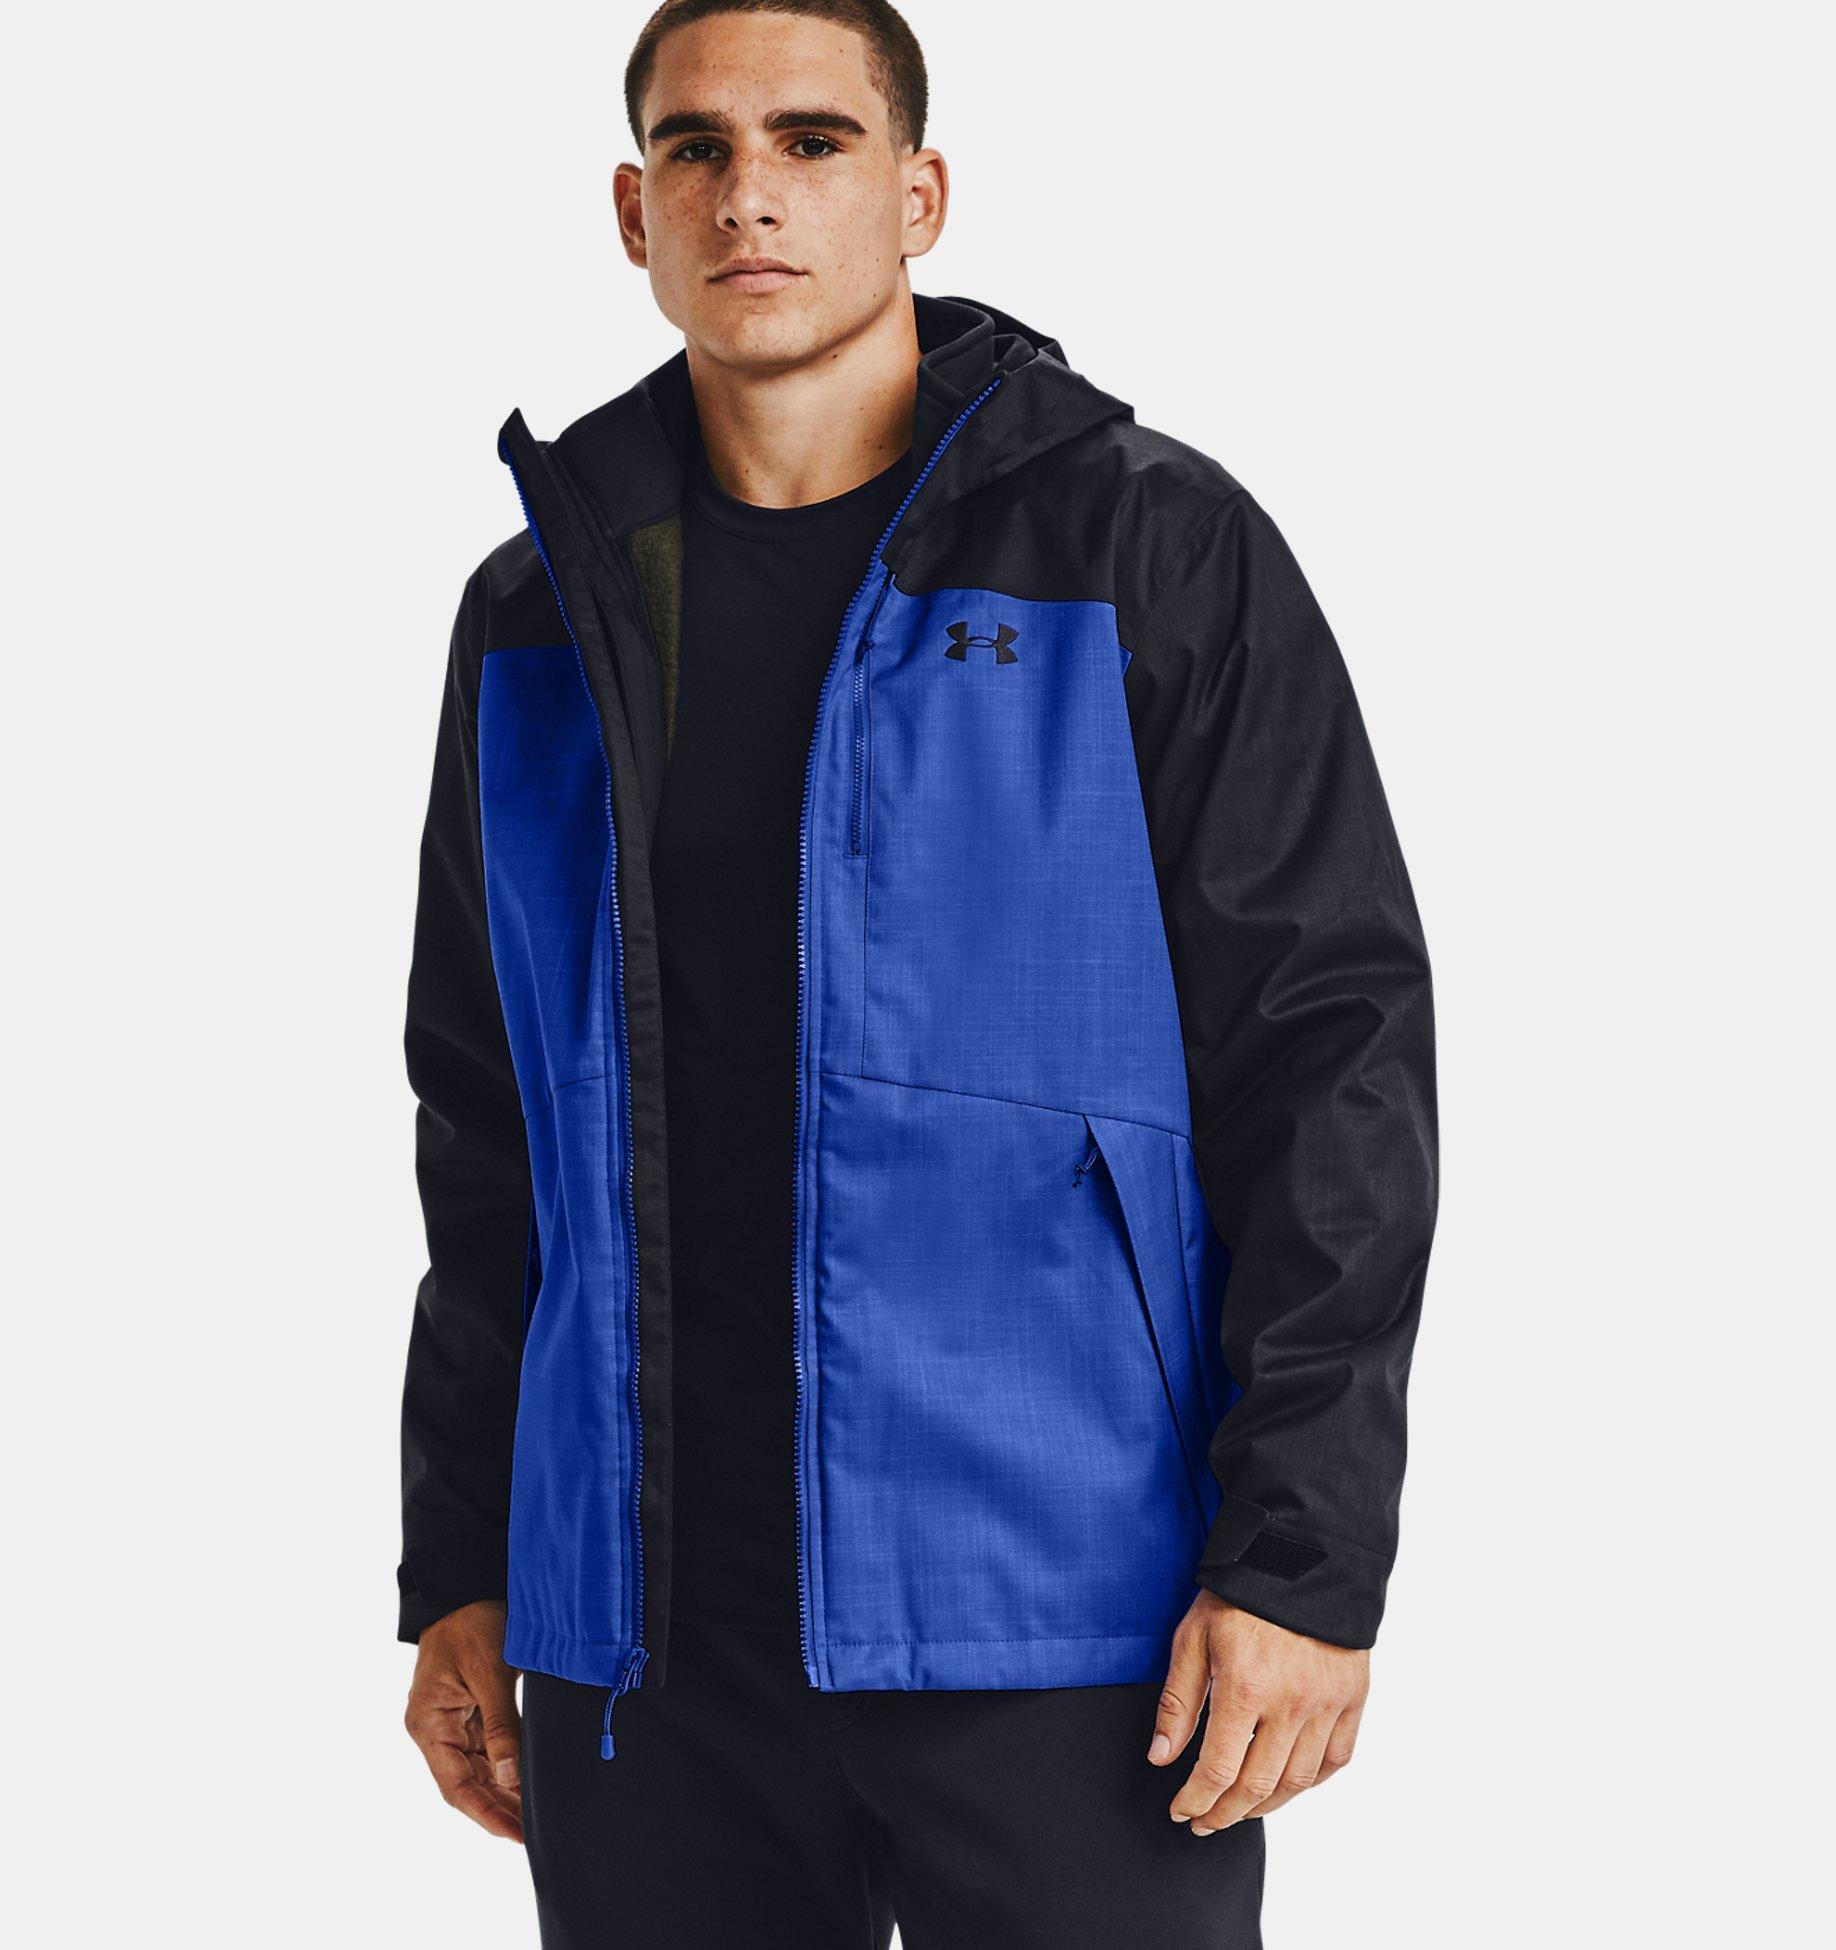 Underarmour Mens UA Porter 3-in-1 Jacket